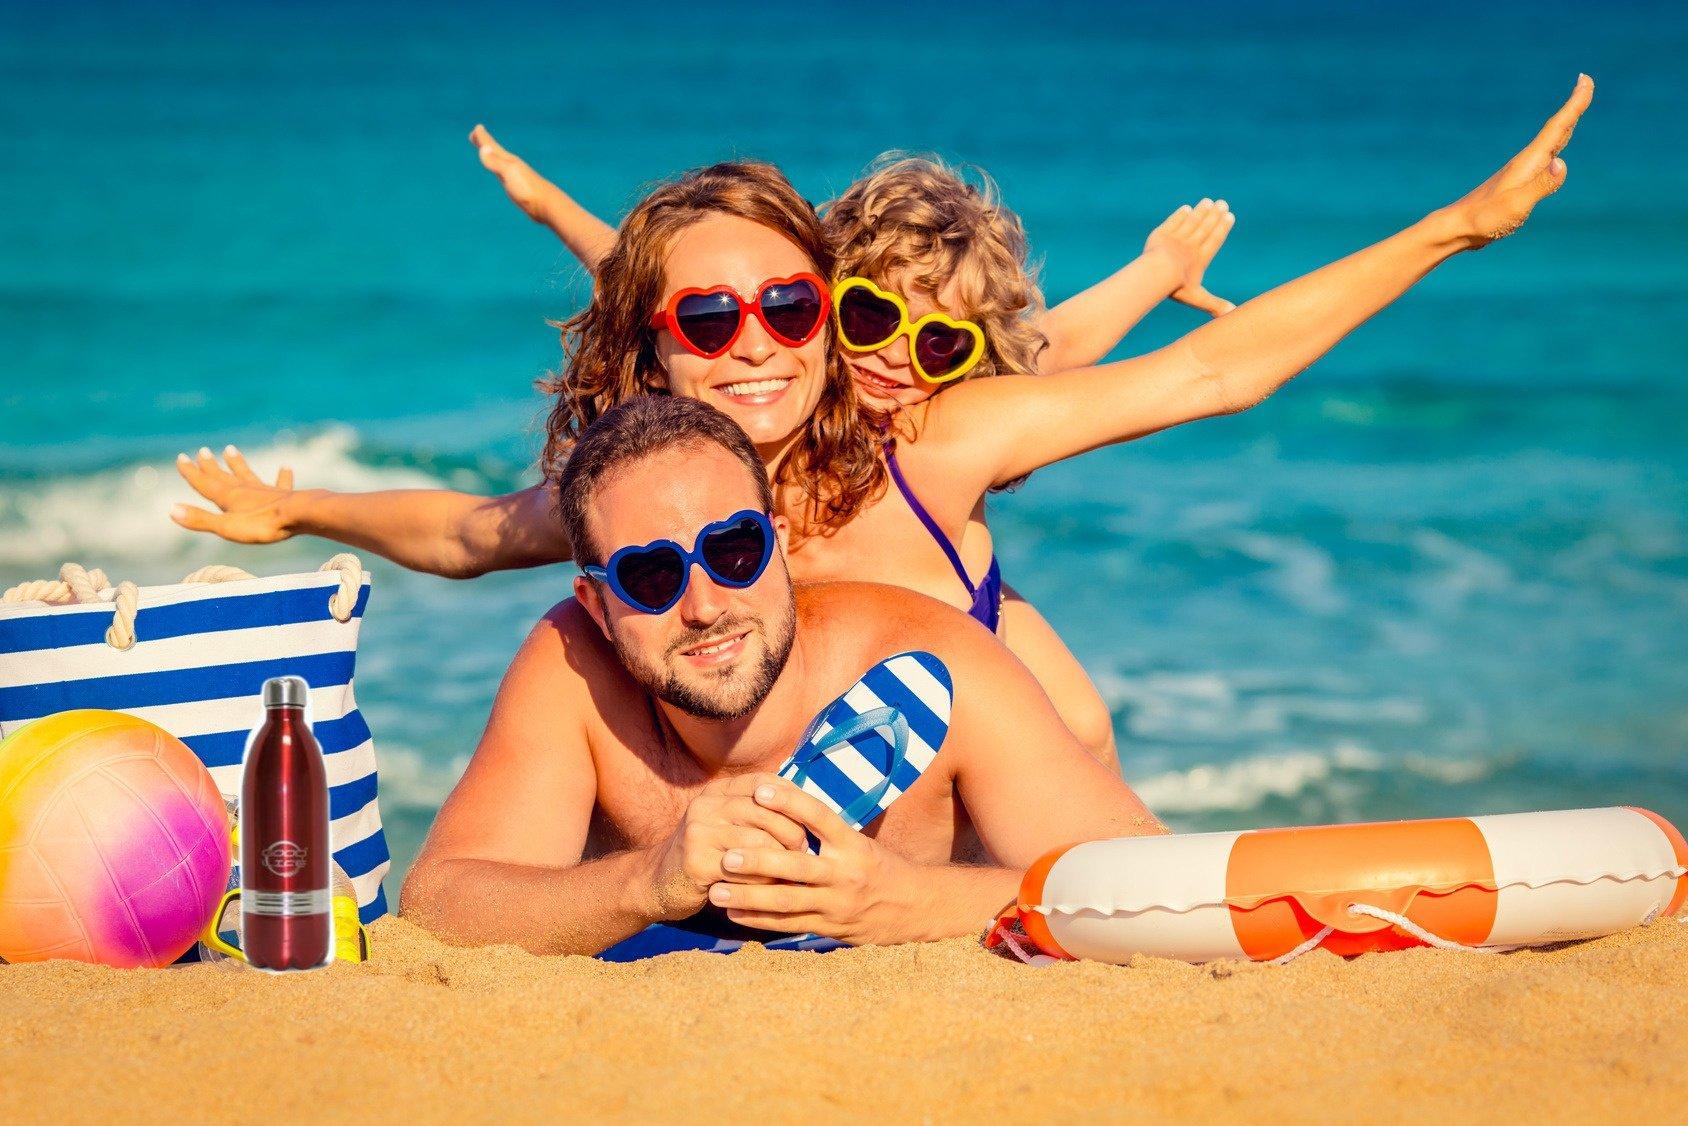 Kick Off Summer in an Alkaline Way